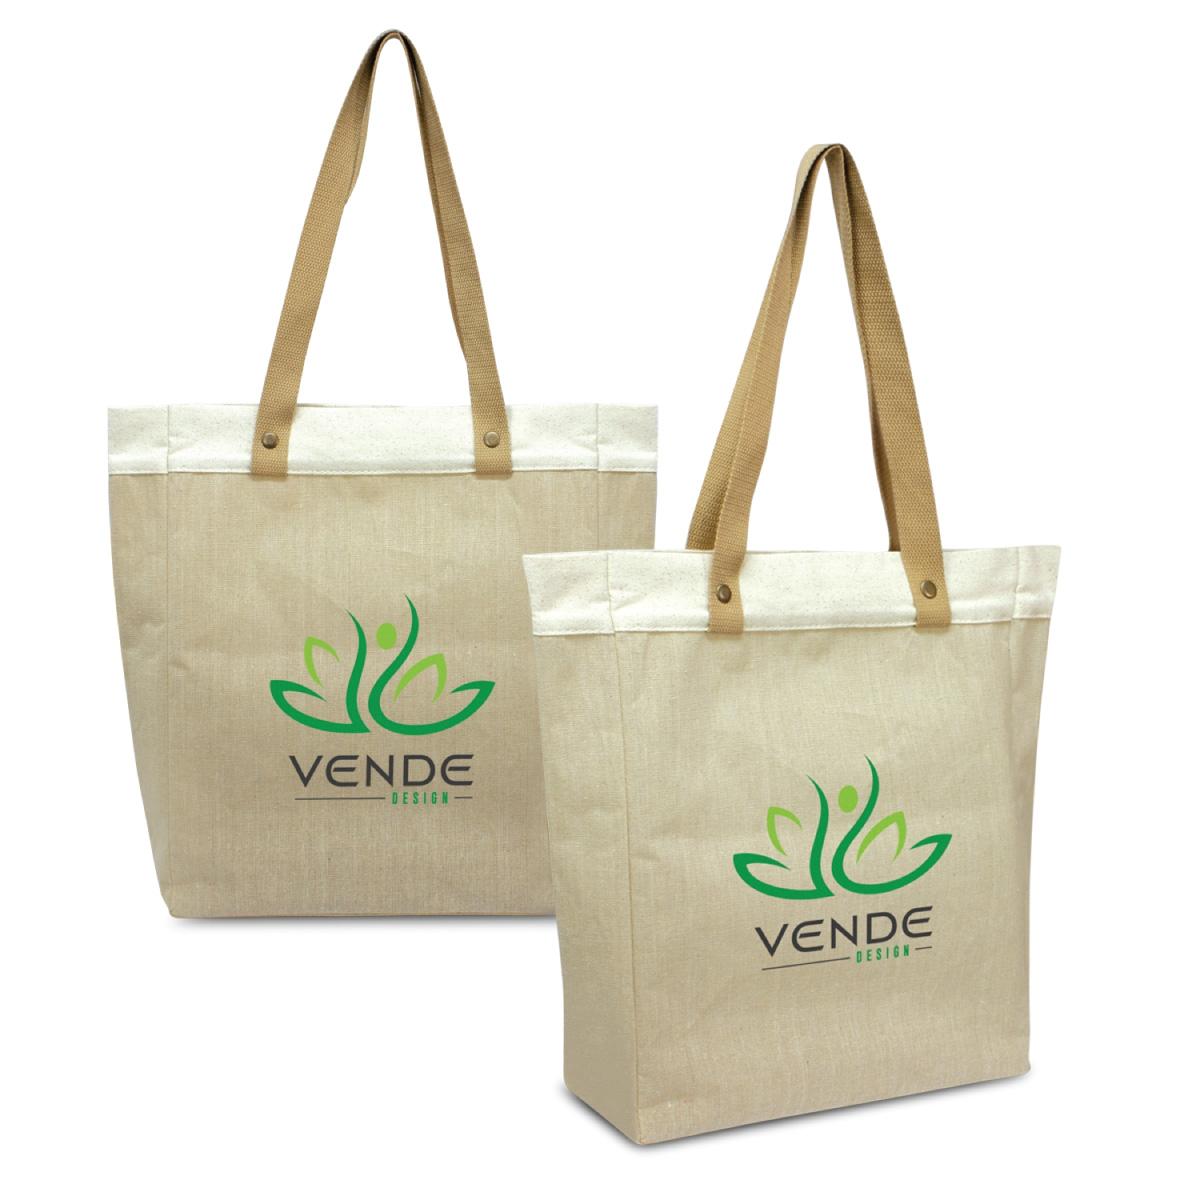 Fashionable Juco Tote Bags Printed